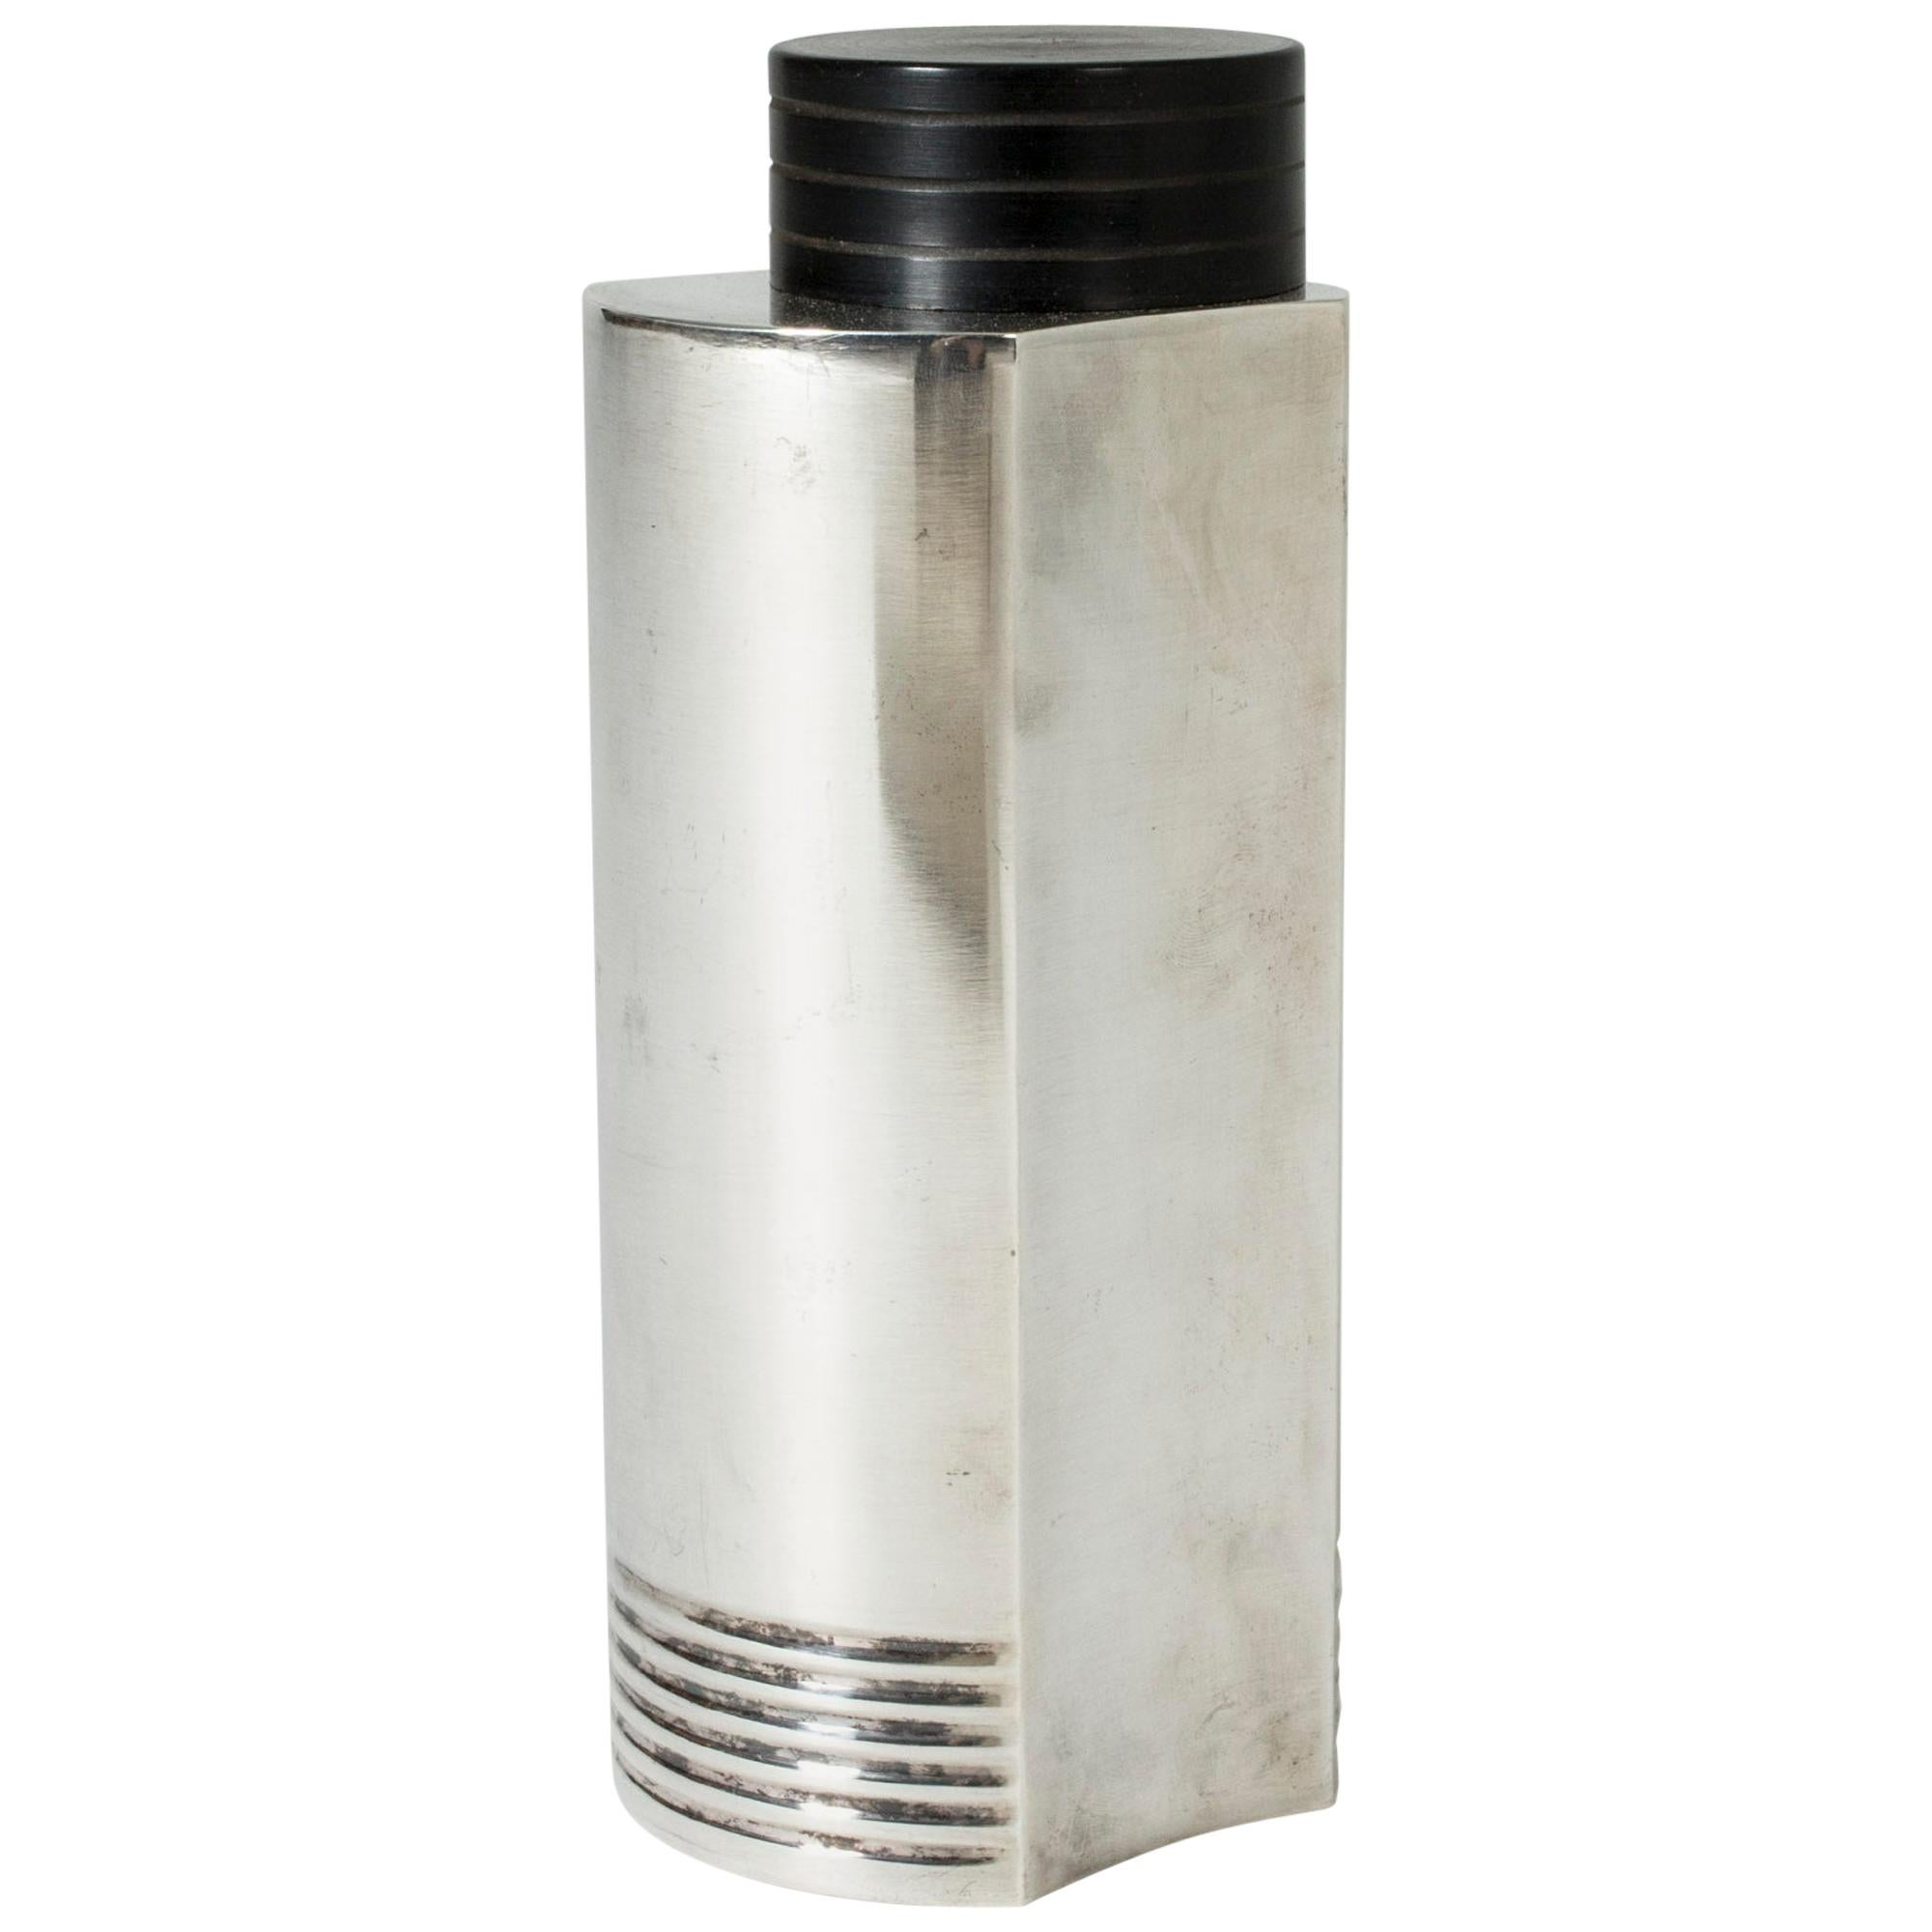 Silver Plated Cocktail Shaker by Folke Arström